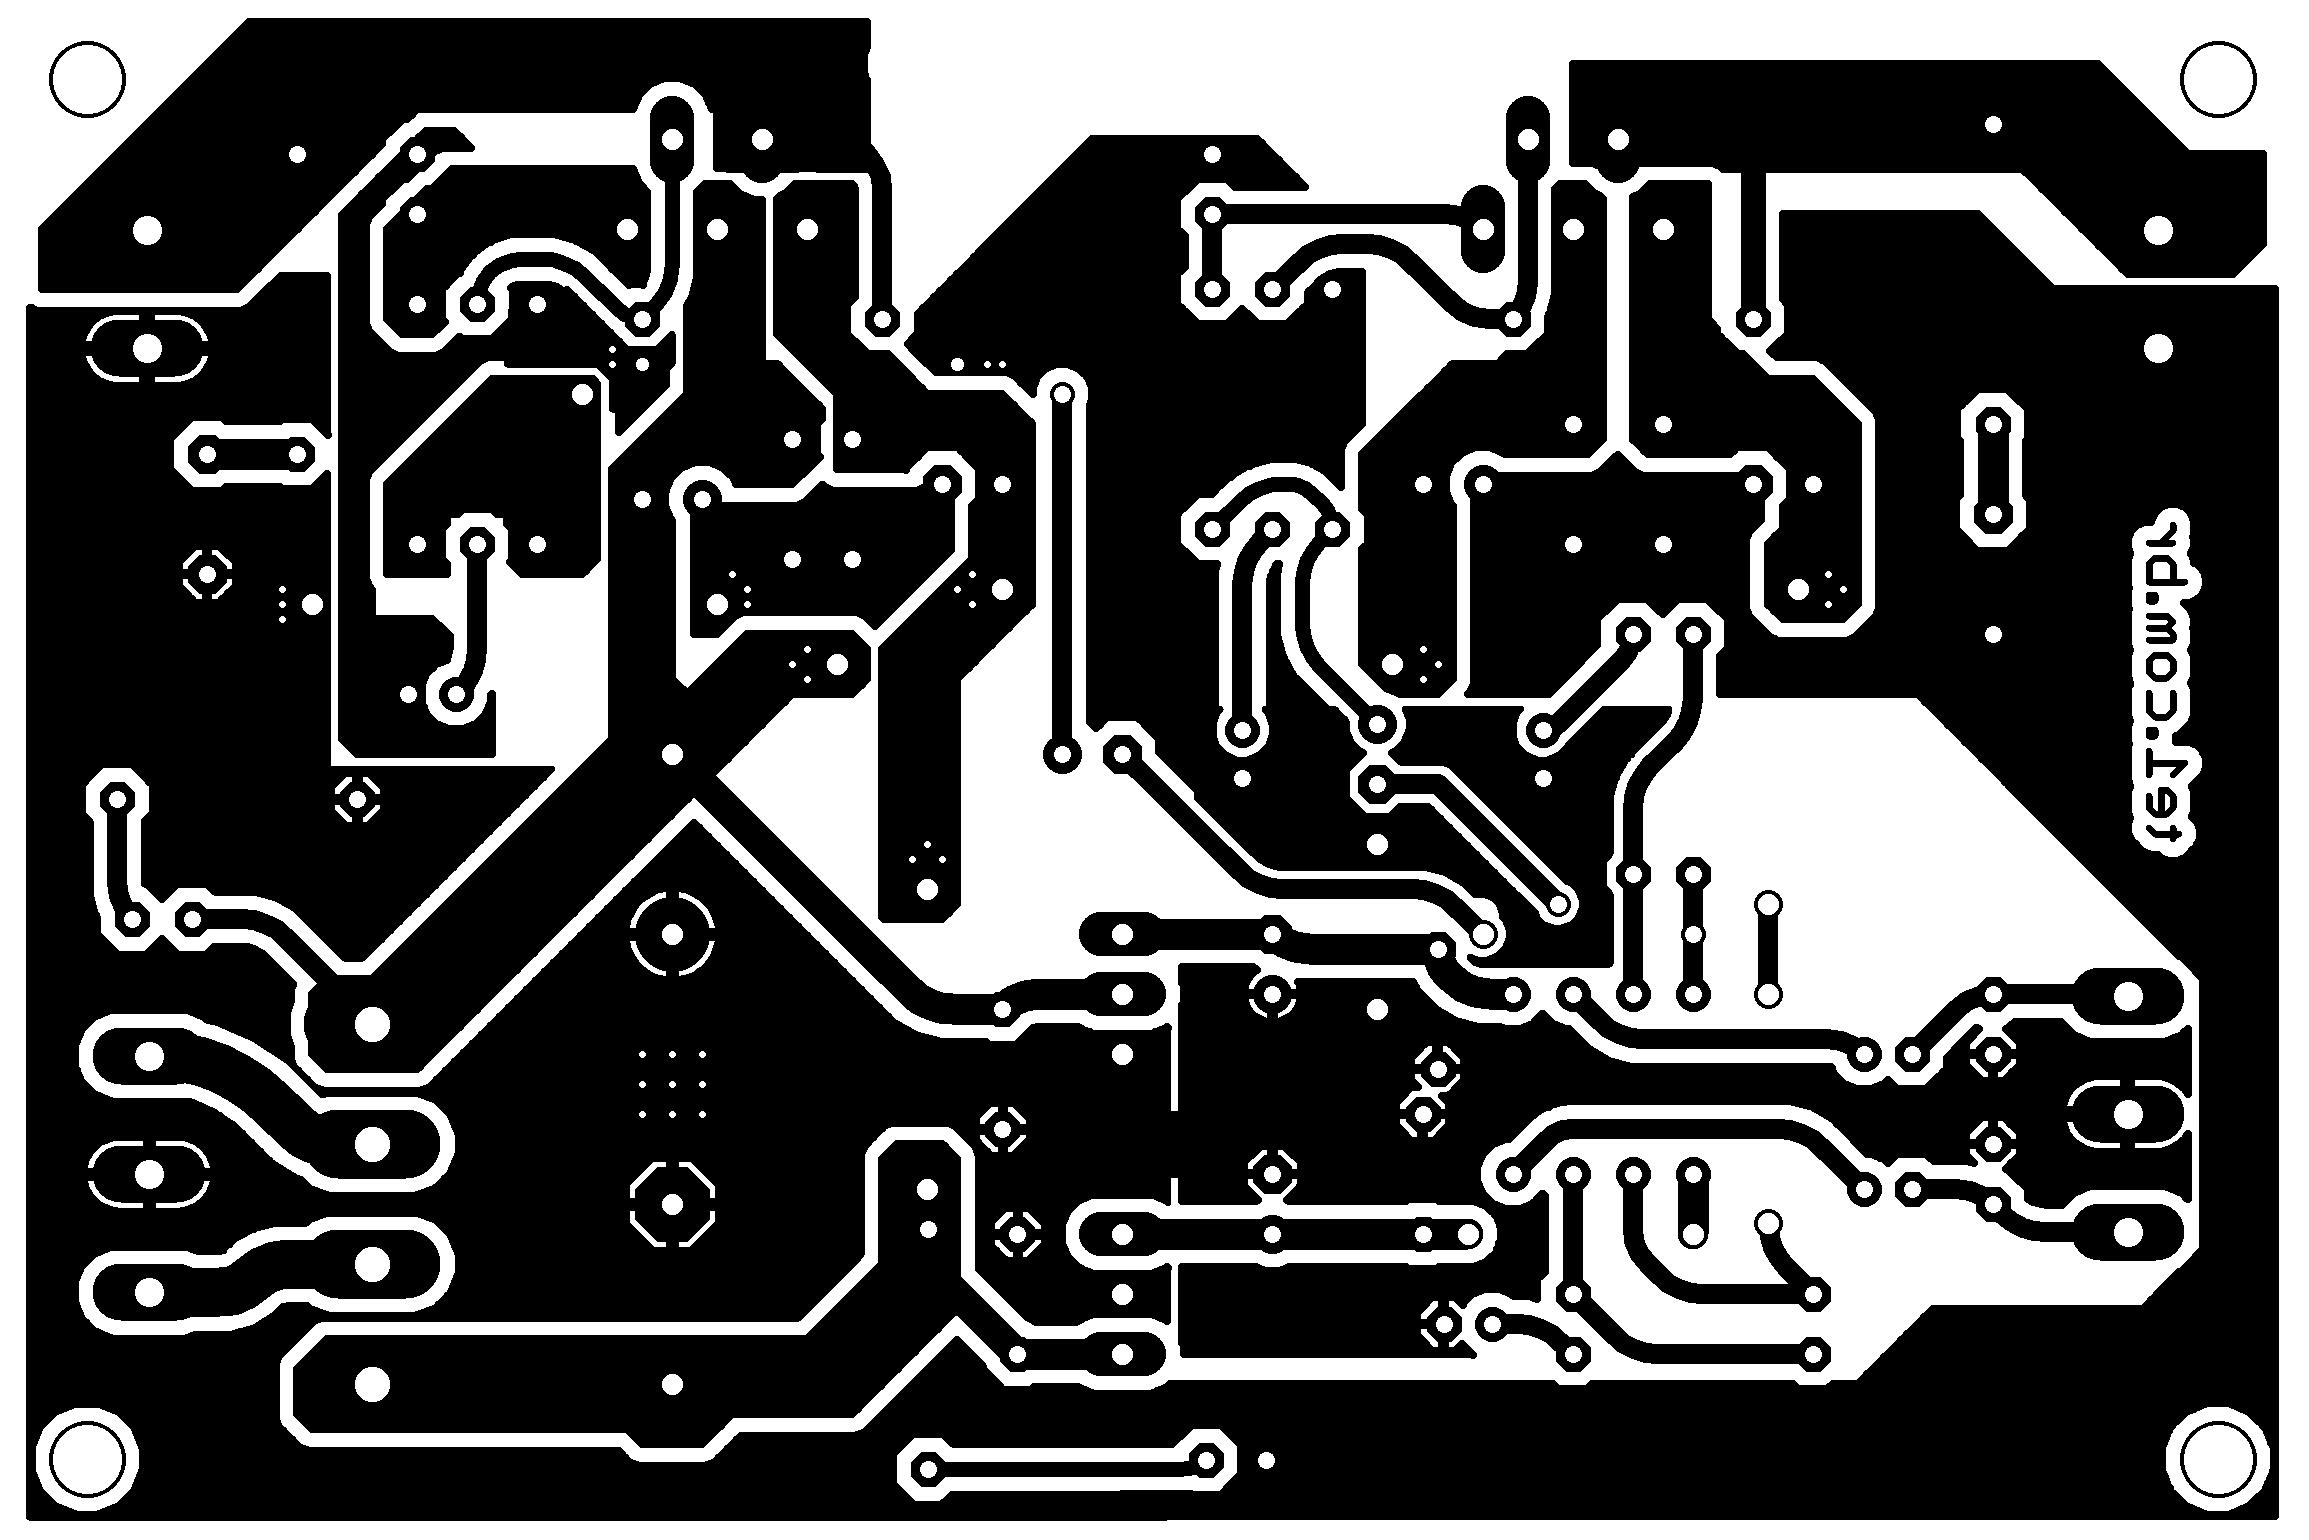 lm1875 amplificador estereo pcb Amplificador de potência estéreo com LM1875 e pré amplificador por NE5532 Pré amplificadores LM Circuitos Áudio